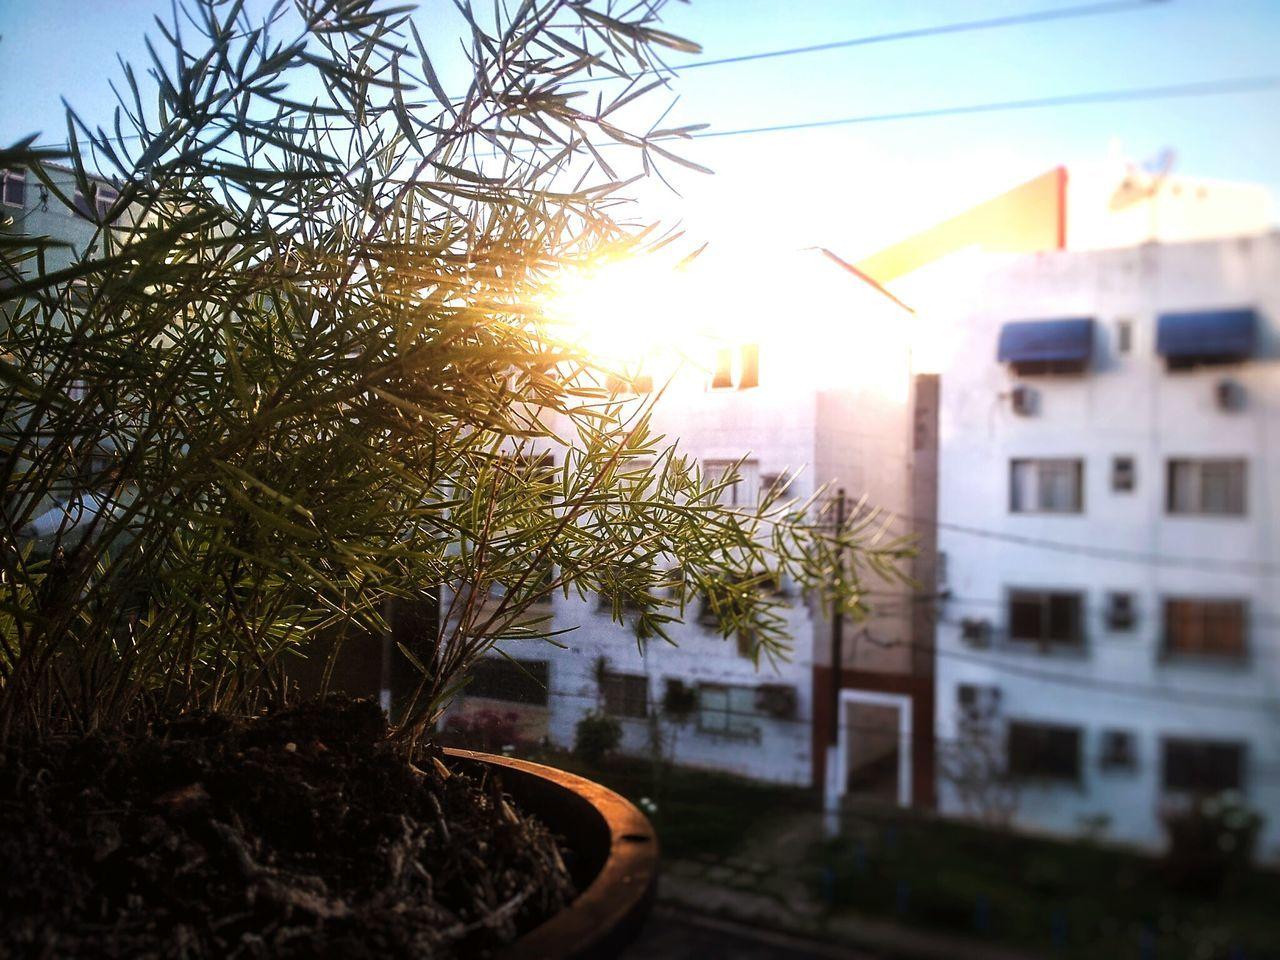 Bestangle Sky Sun Outdoors Green Nature Macro Focus